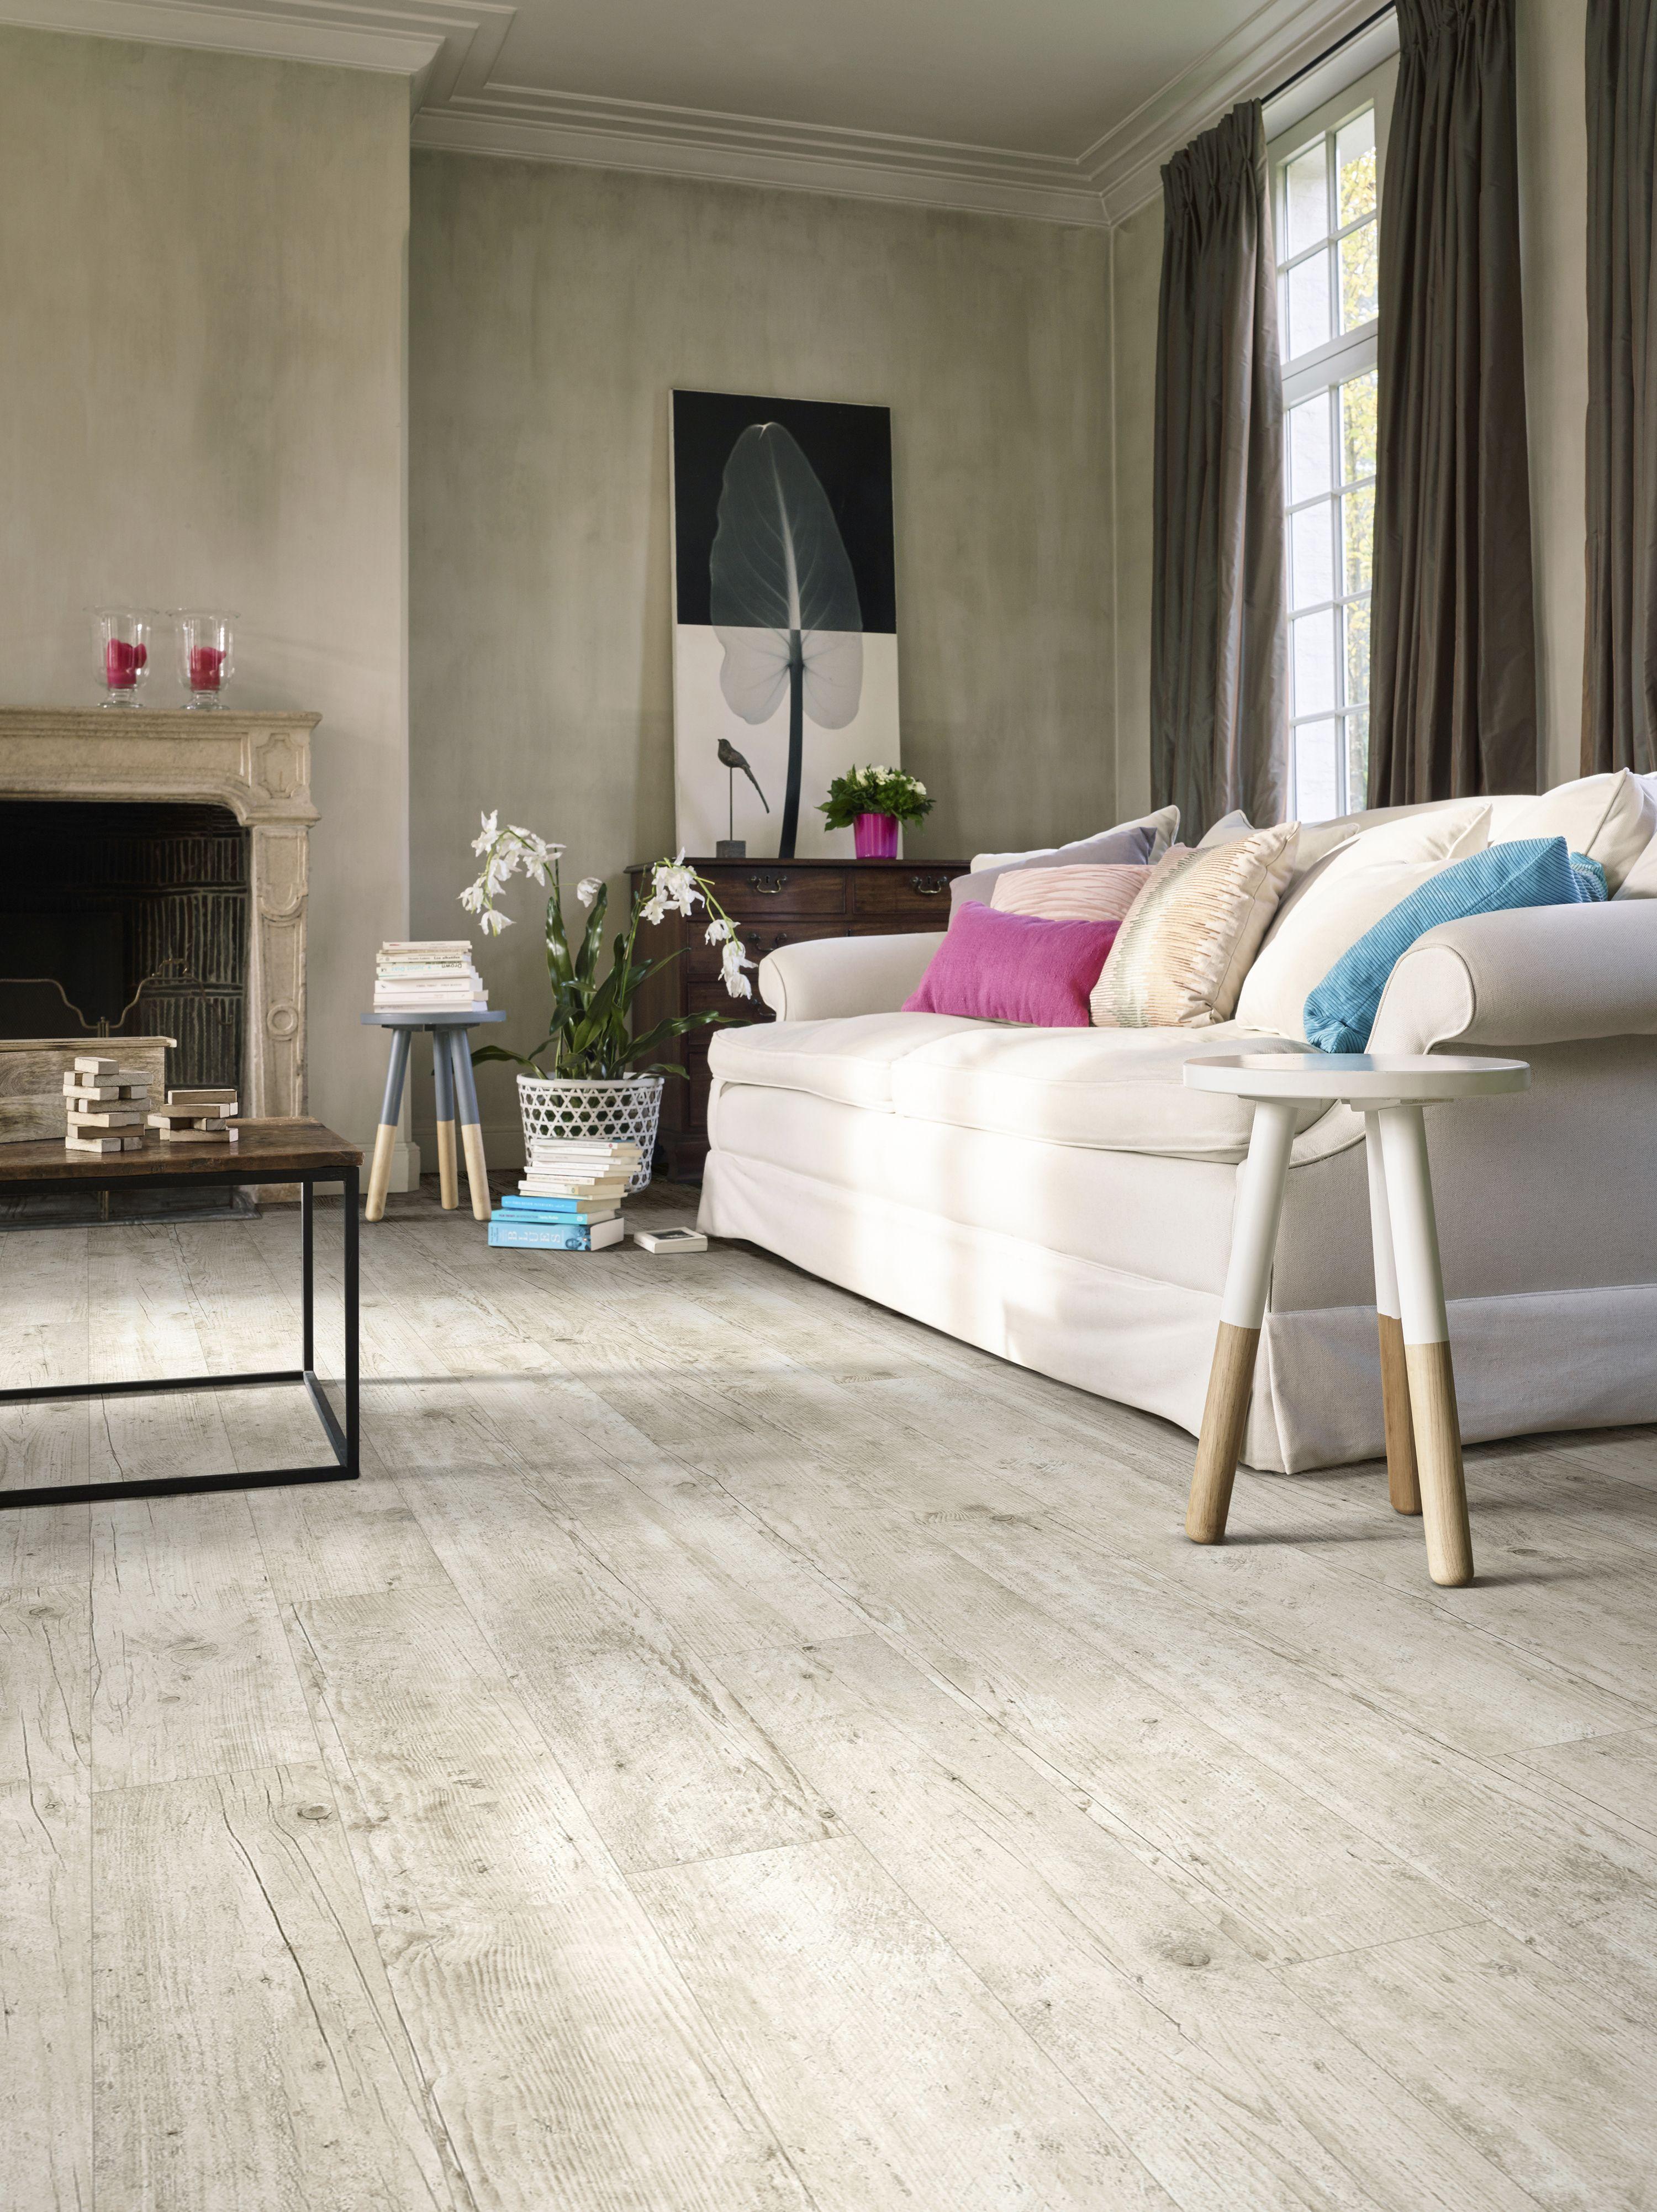 Verona oak 133 laminate floors vitality laminate floors verona oak 133 laminate floors dailygadgetfo Images